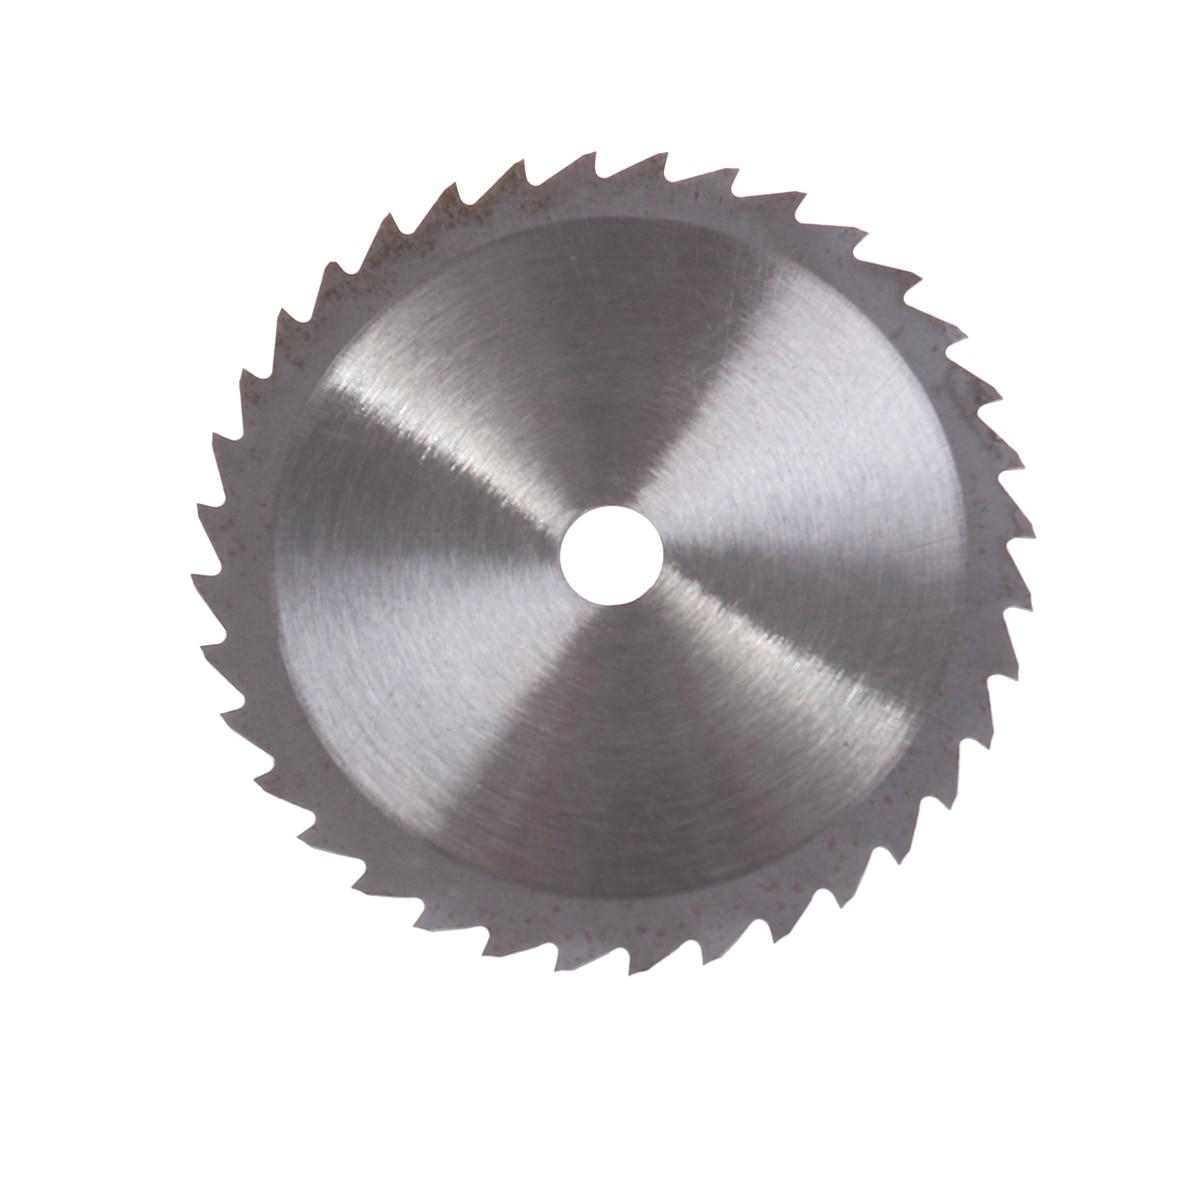 High Quality Mini HSS Circular Saw Slice 85MM Crosscut Slice For Rotary Tools